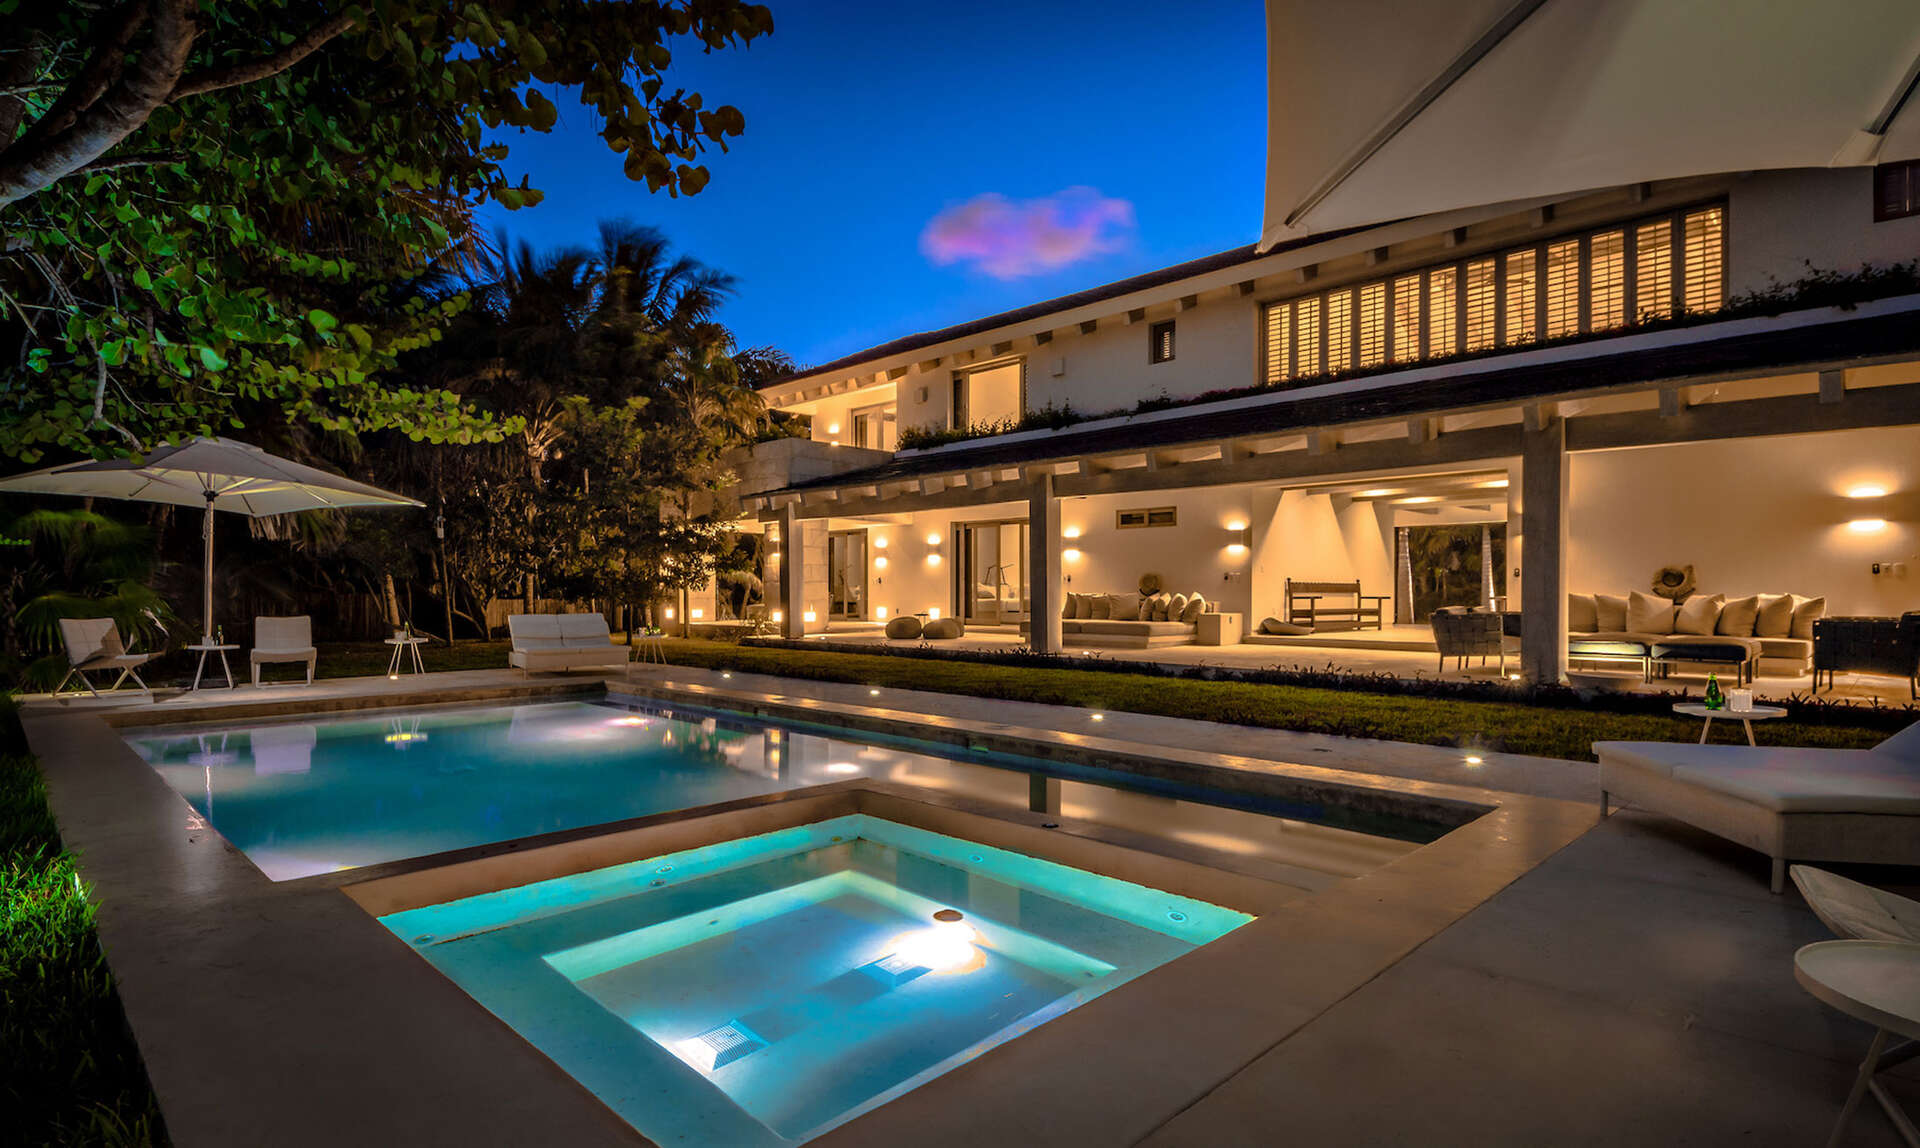 Luxury vacation rentals mexico - Riviera maya - Tulum - Tulum beach zone - Casa Ixchel - Image 1/12